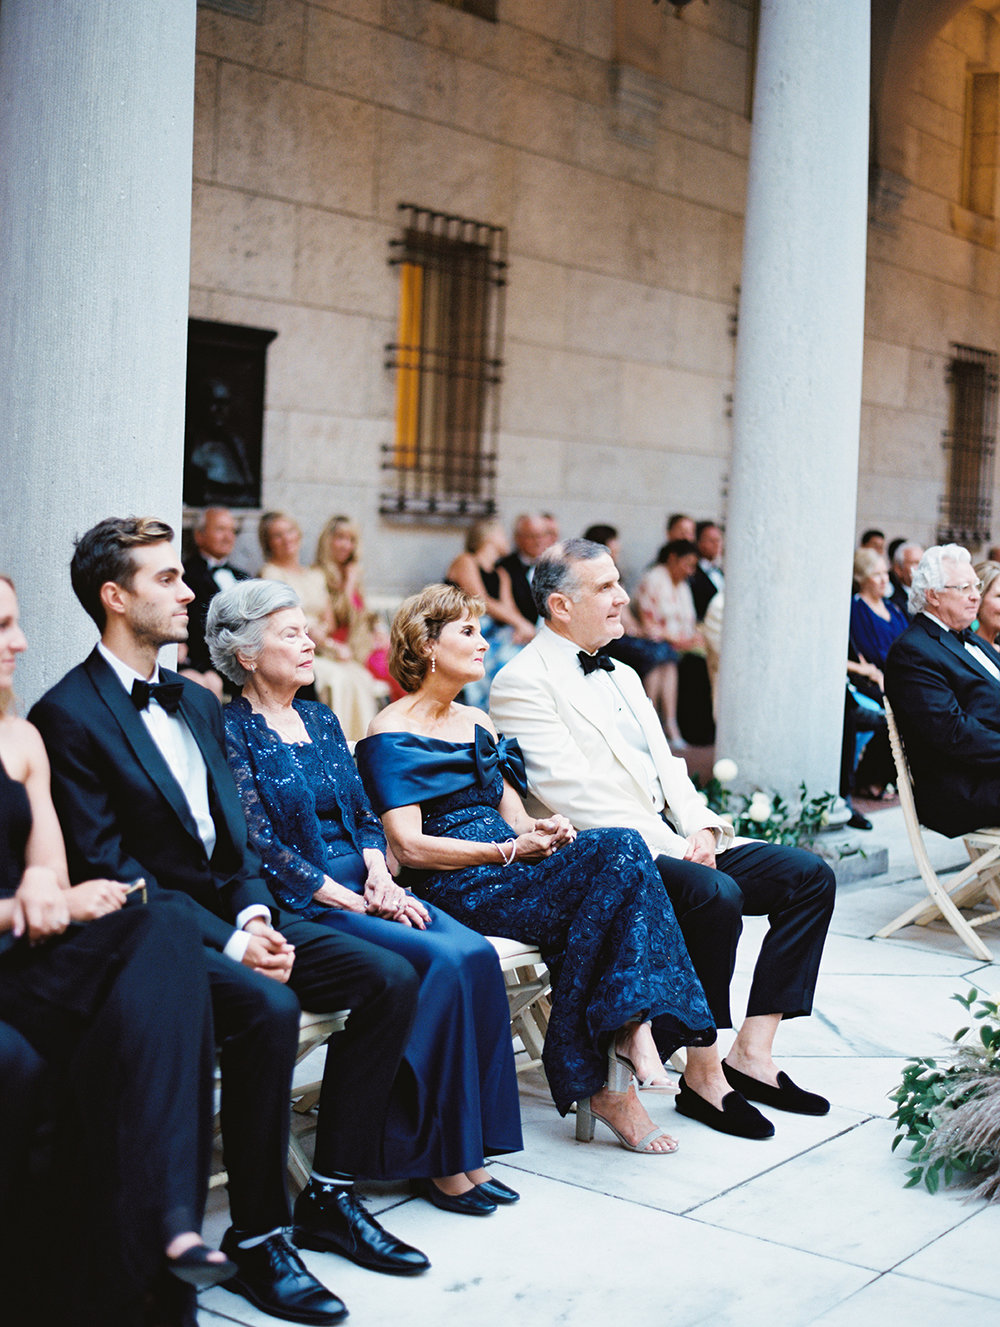 503-andrew-megan-boston-public-library-wedding-film-photographer.jpg